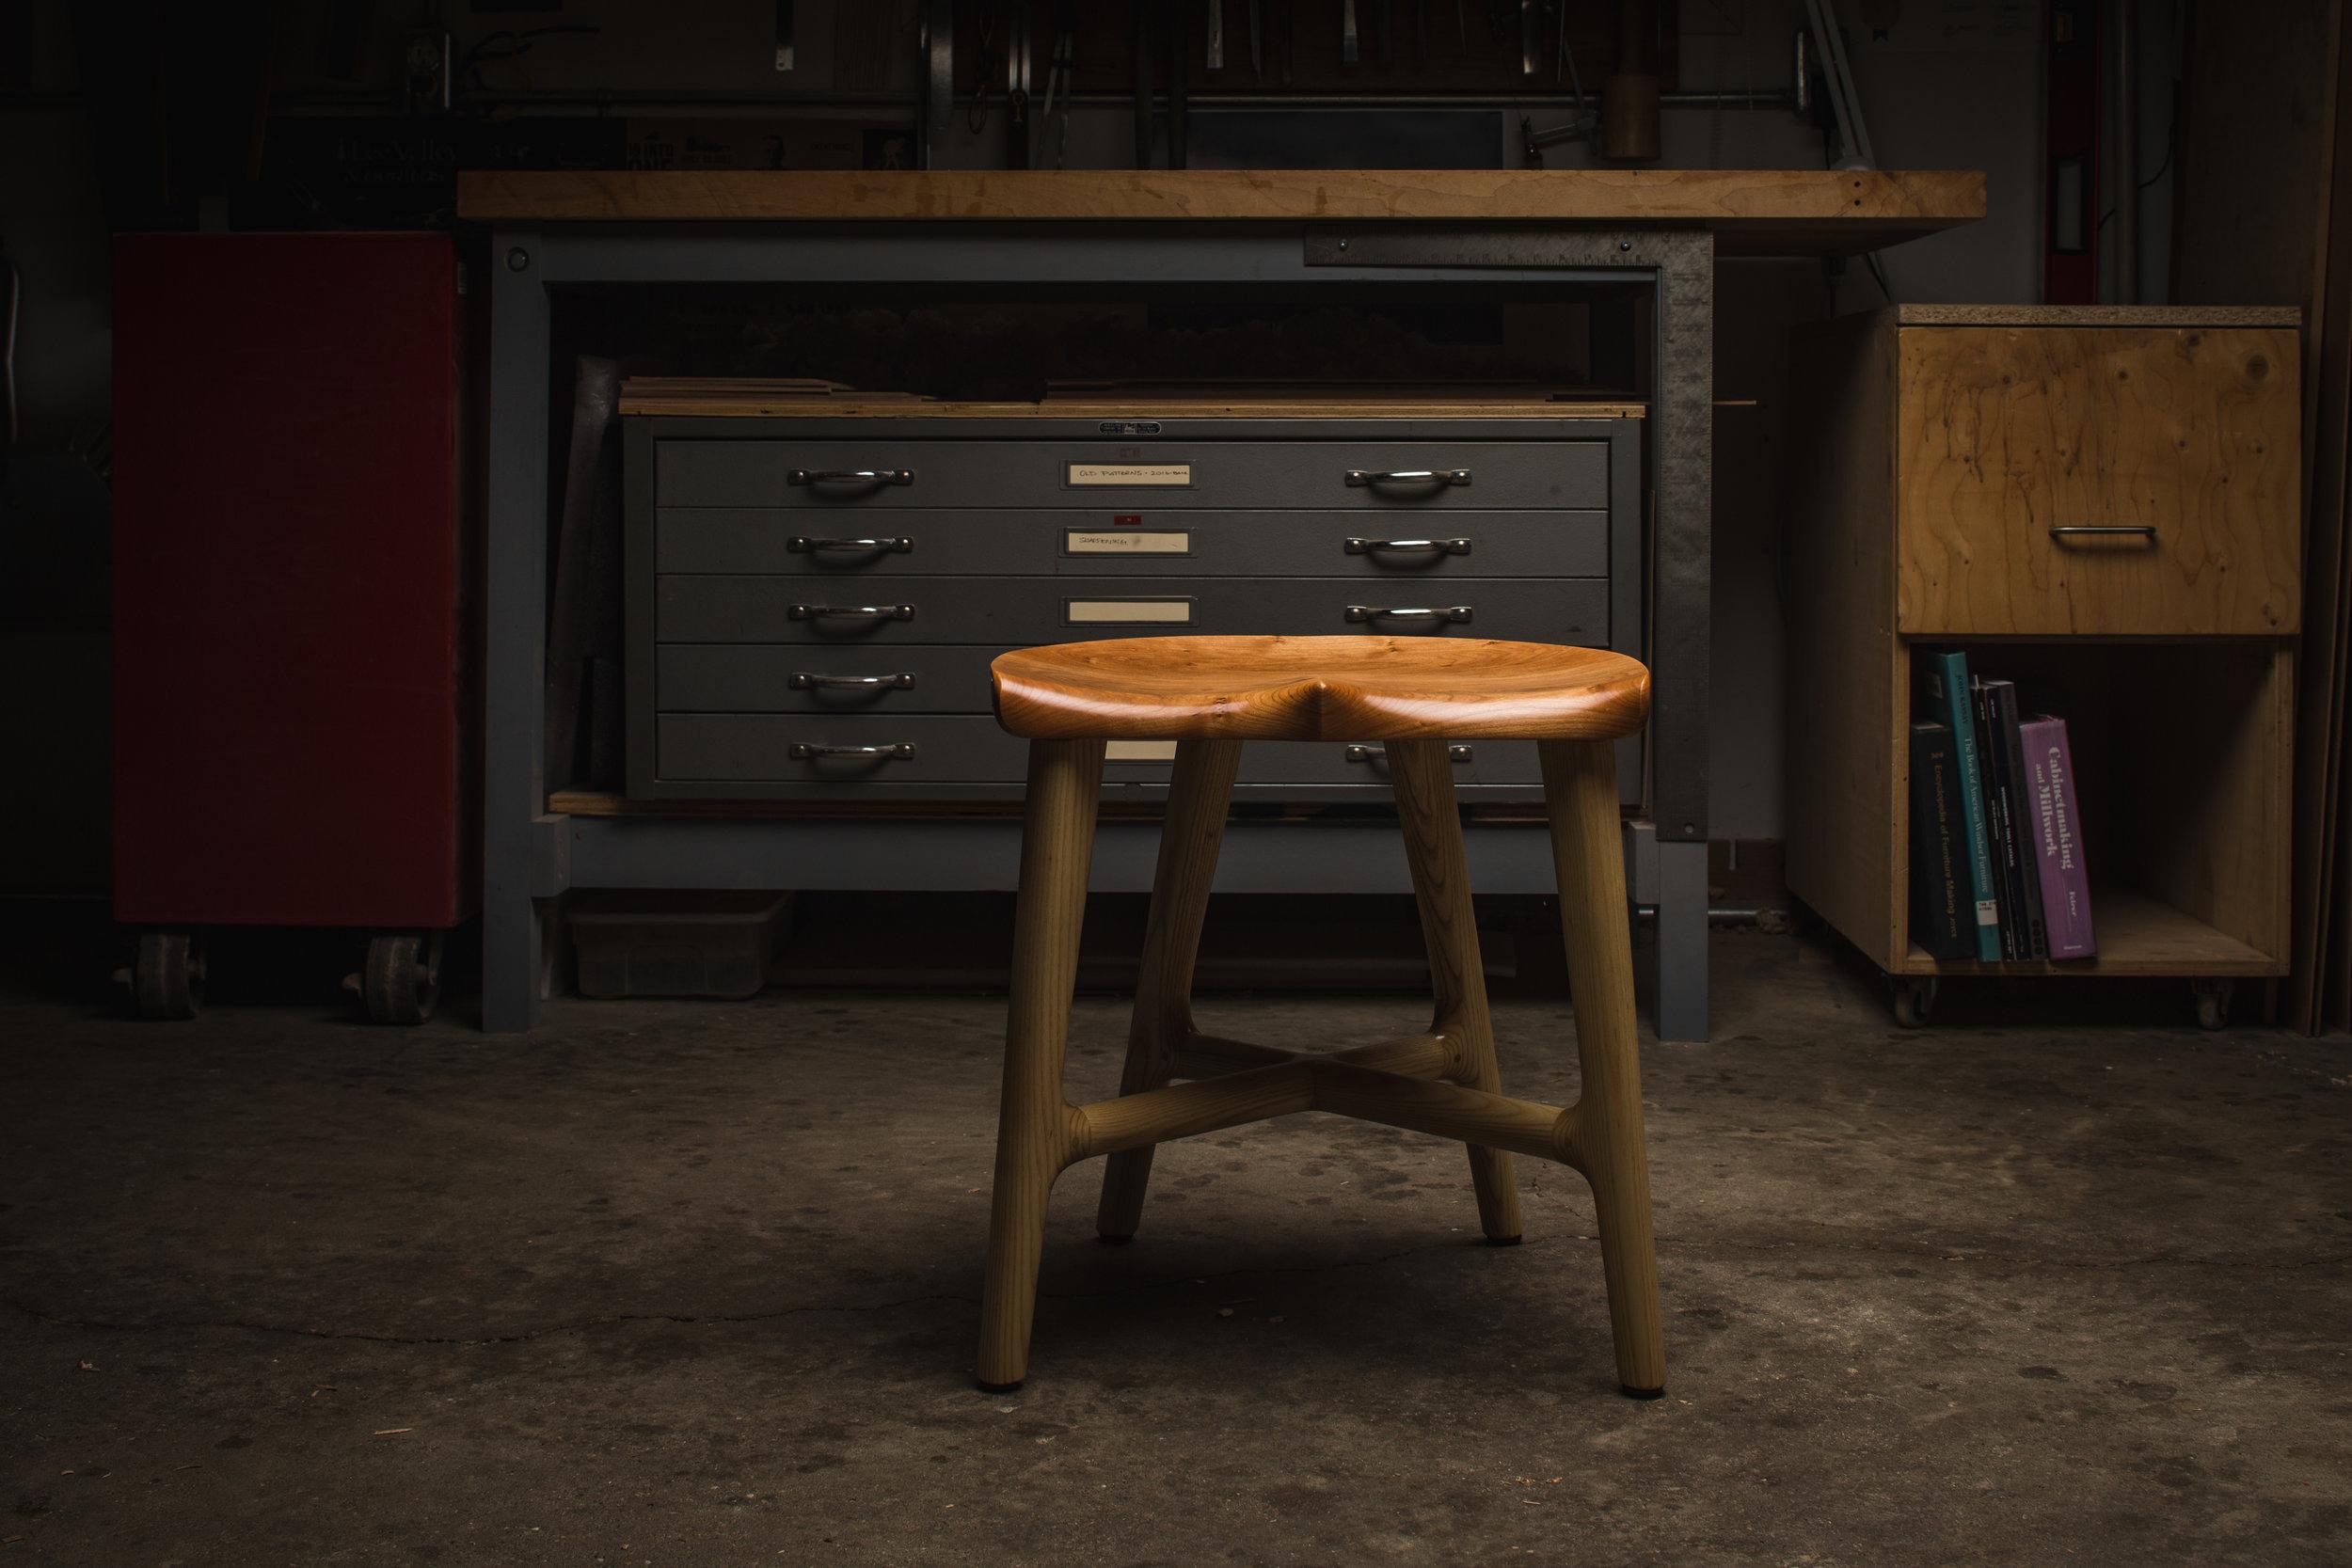 Bottomer stool by Kenton Jeske